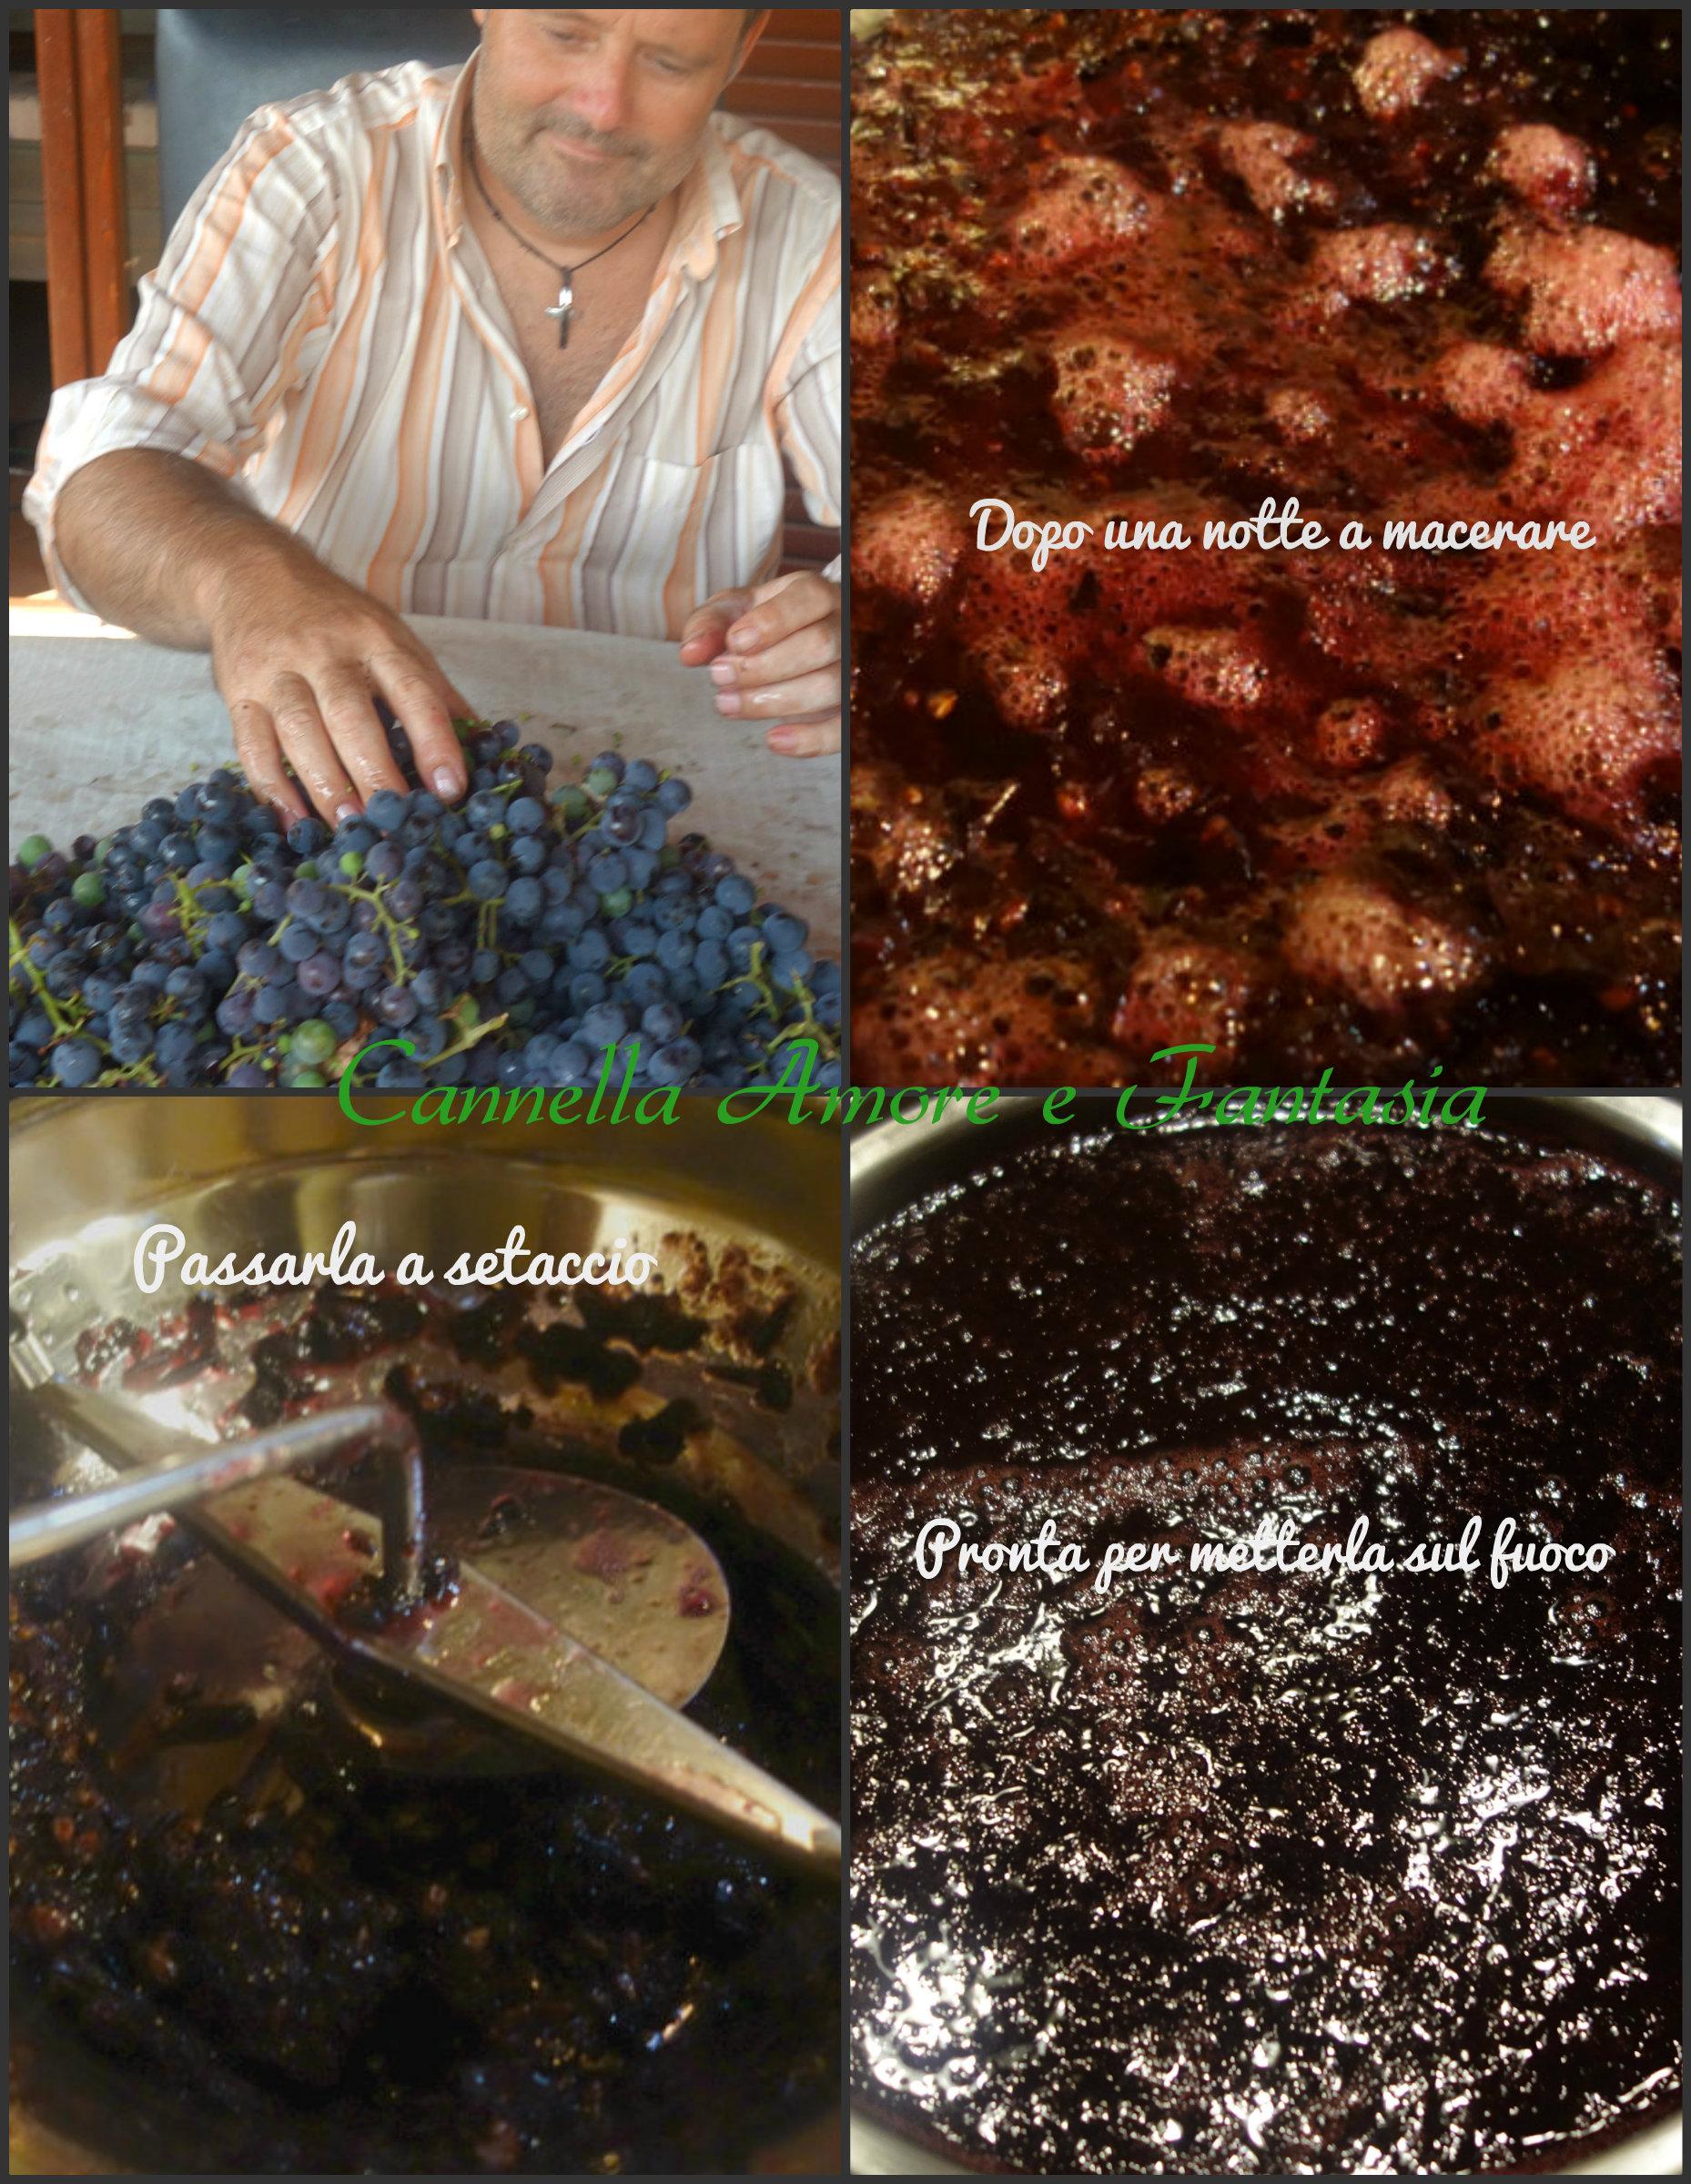 Gelatina d'uva fragola Collage finito 1